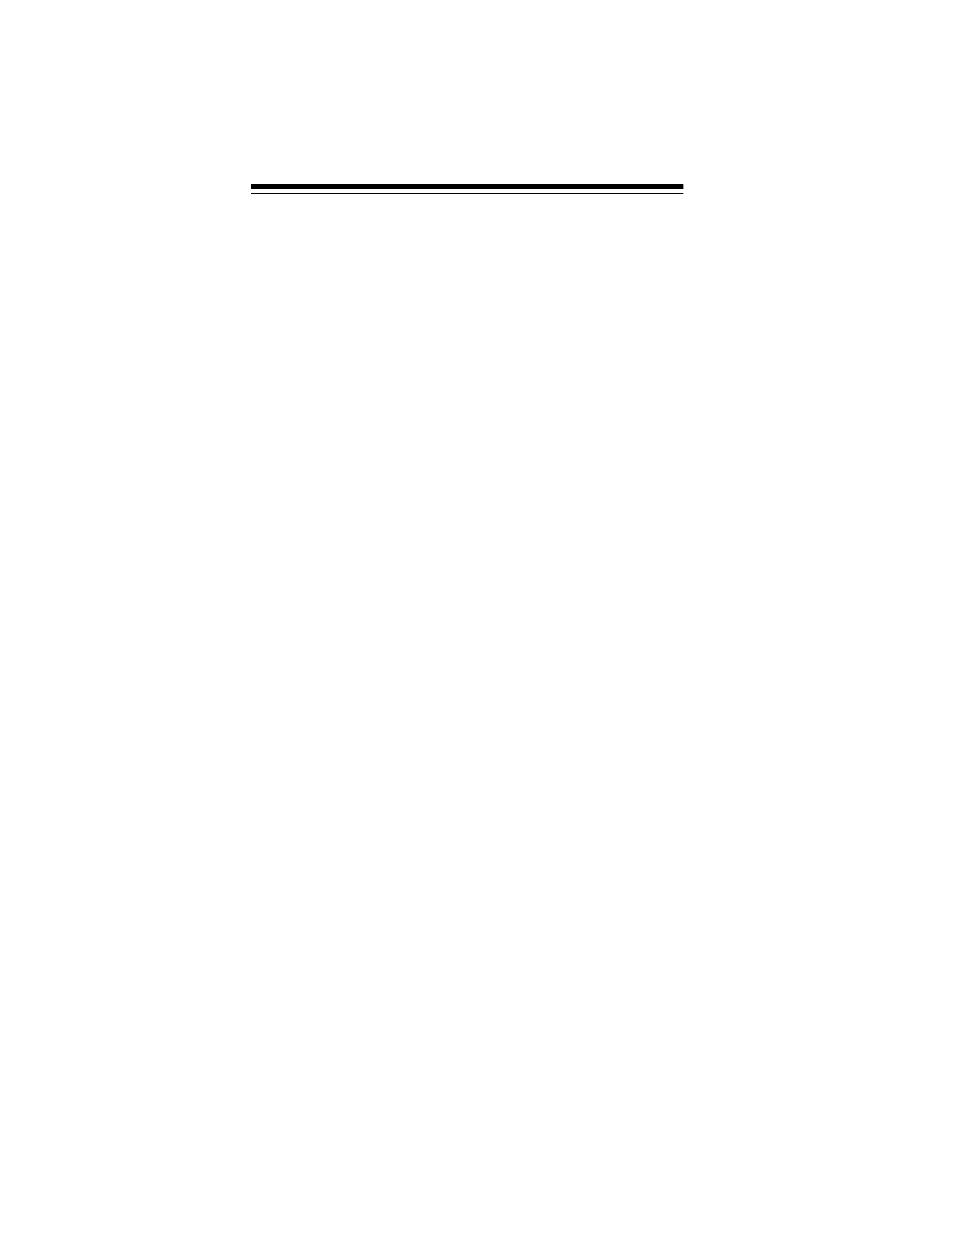 radio shack pro 89 manual